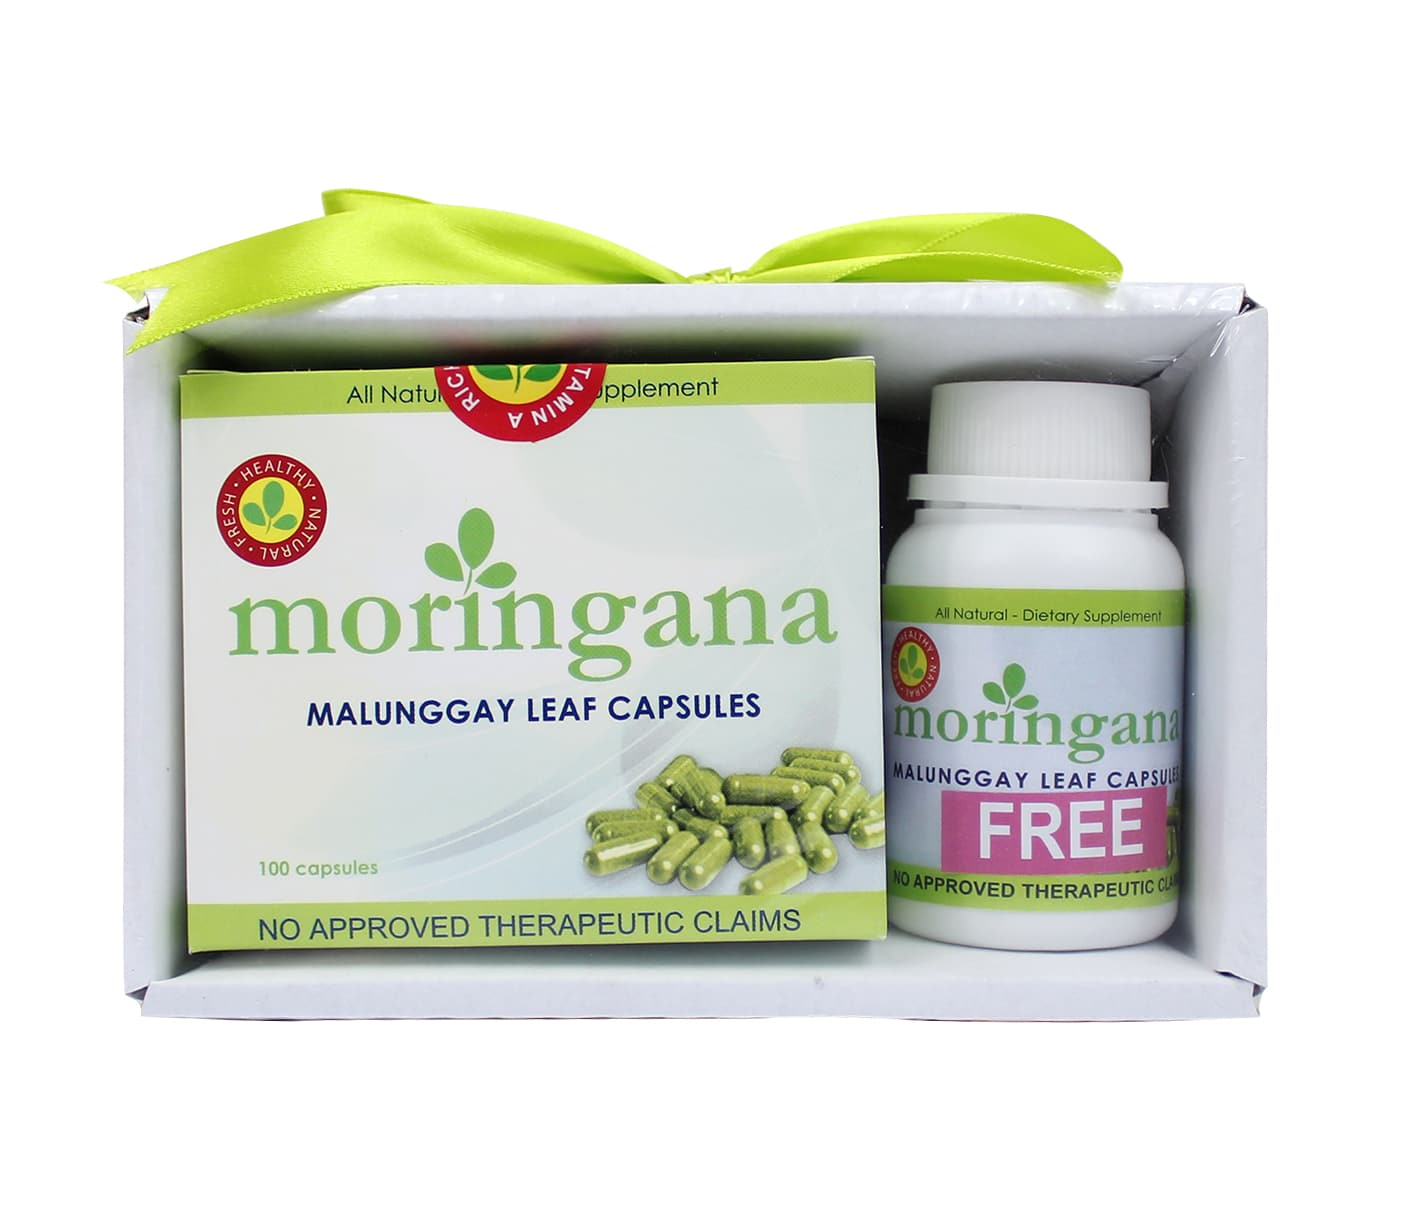 malunggay as vitamin capsule